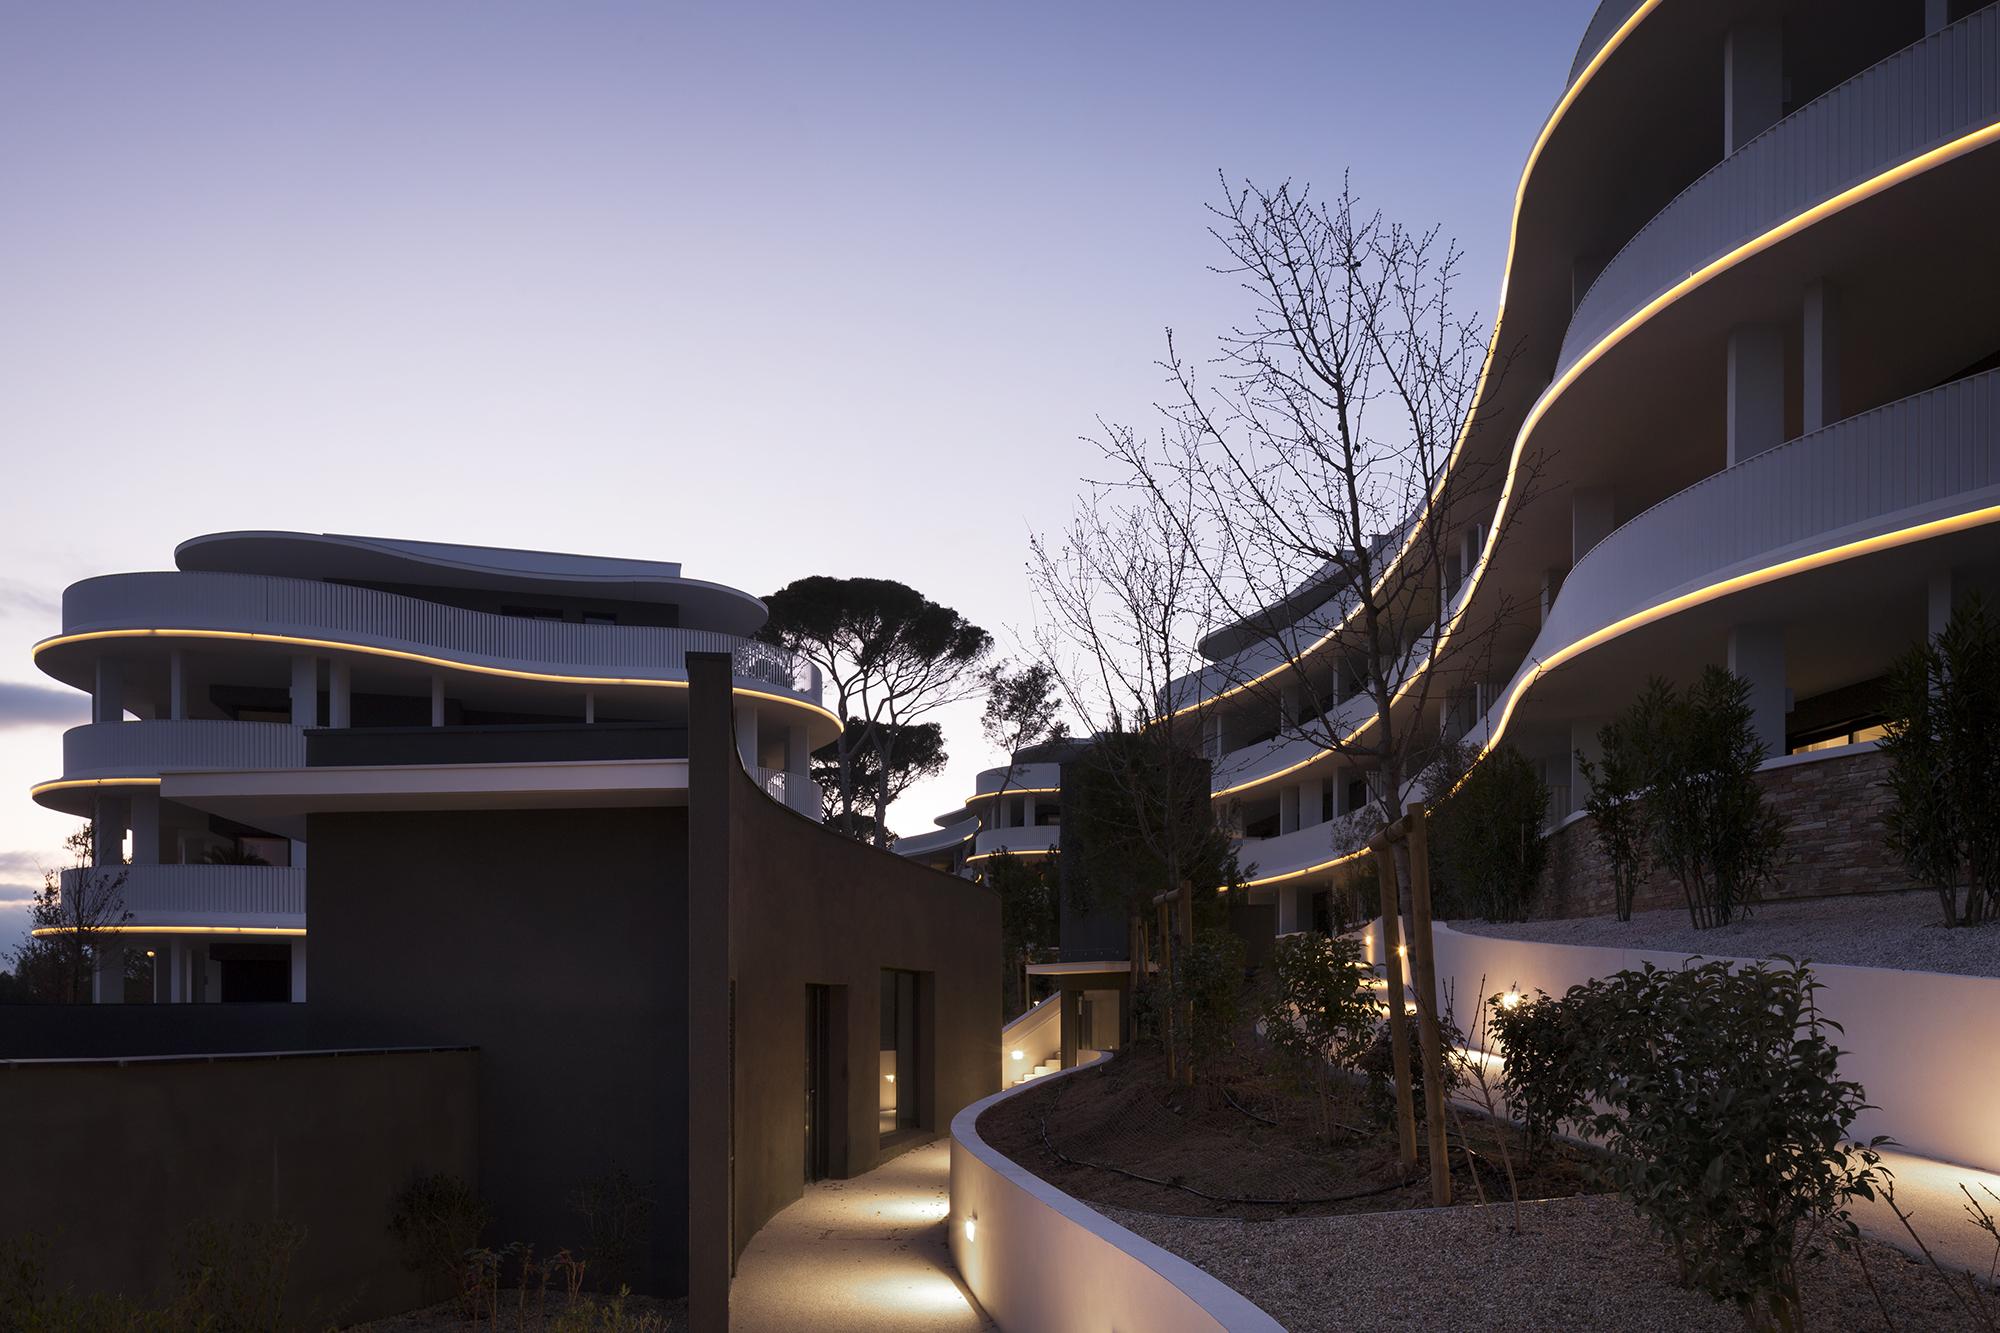 garciadiaz-architecture-palazzodiluce-castelnaulelez-mariecarolinelucat-architecturephotography-2018